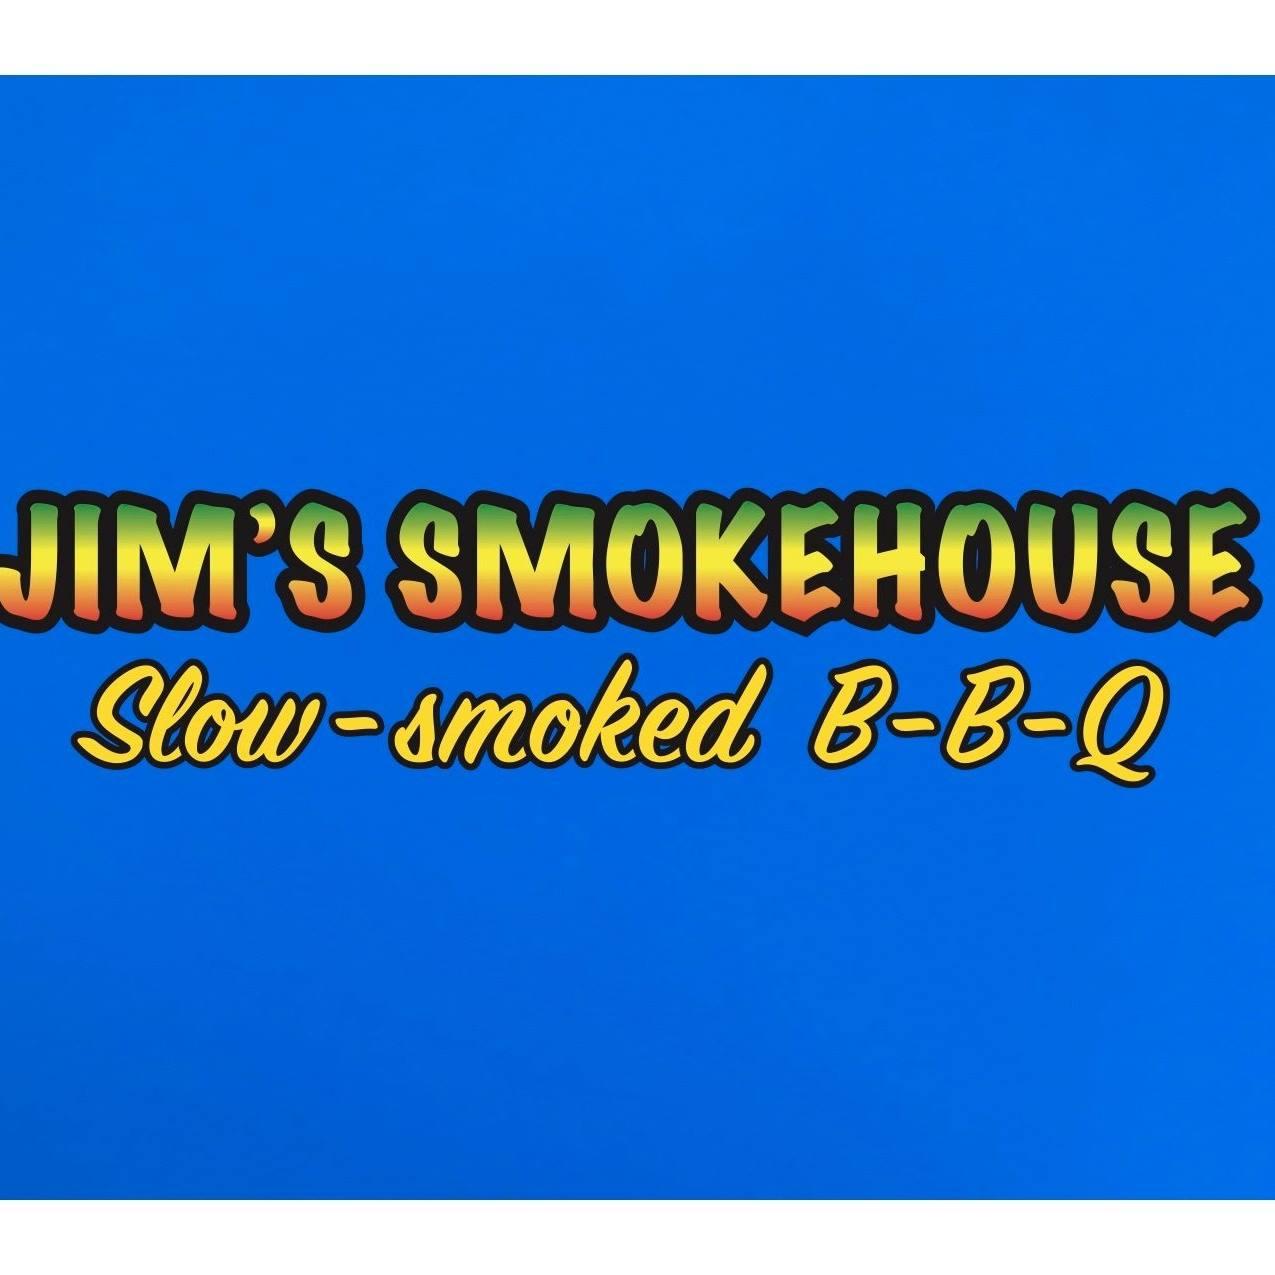 Jim's Smokehouse